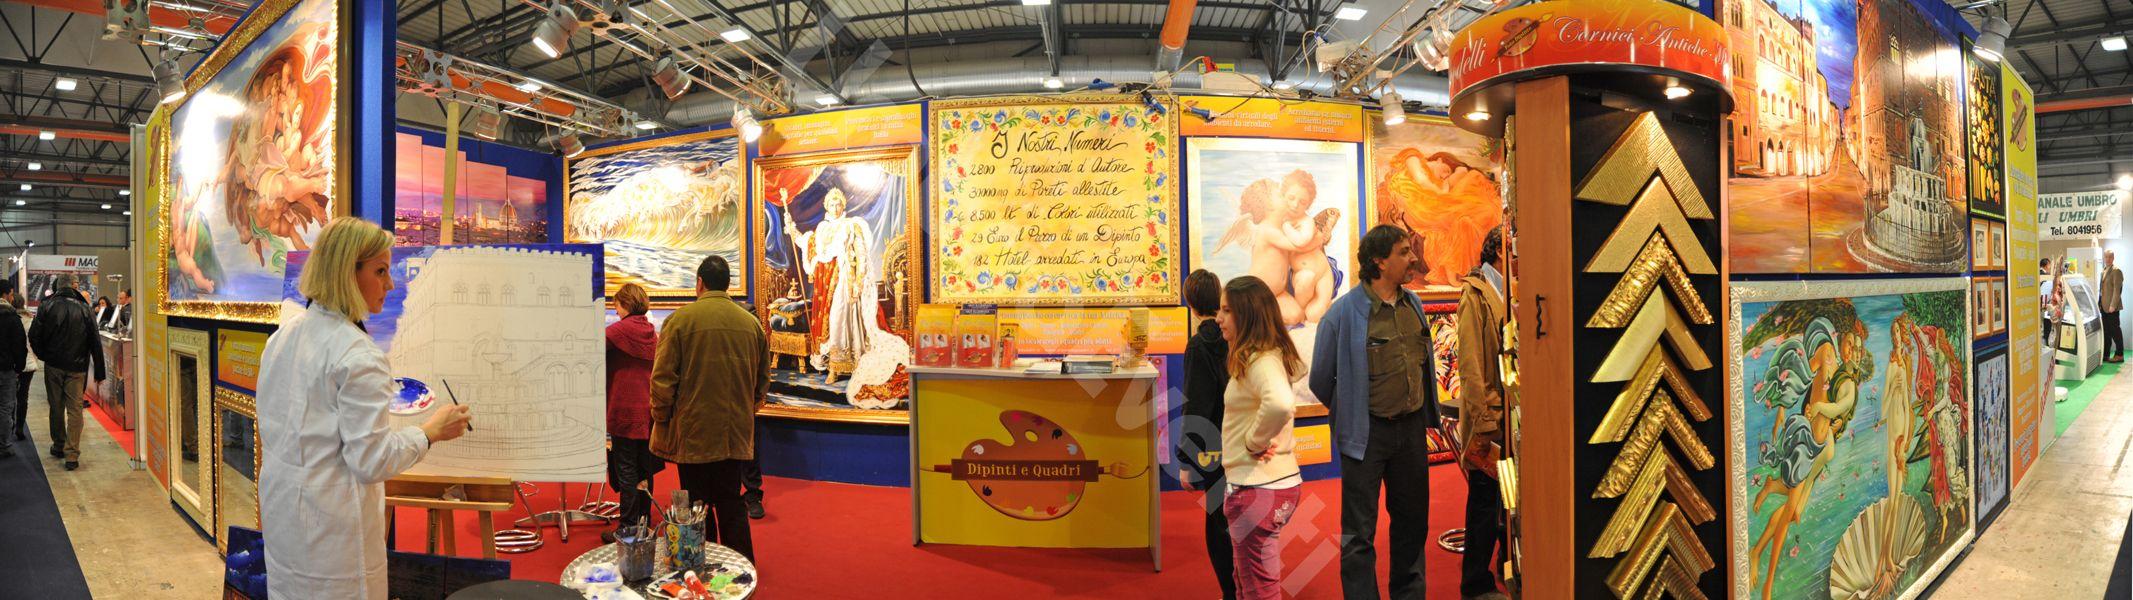 Expo Tecnocom - Bastia Umbra